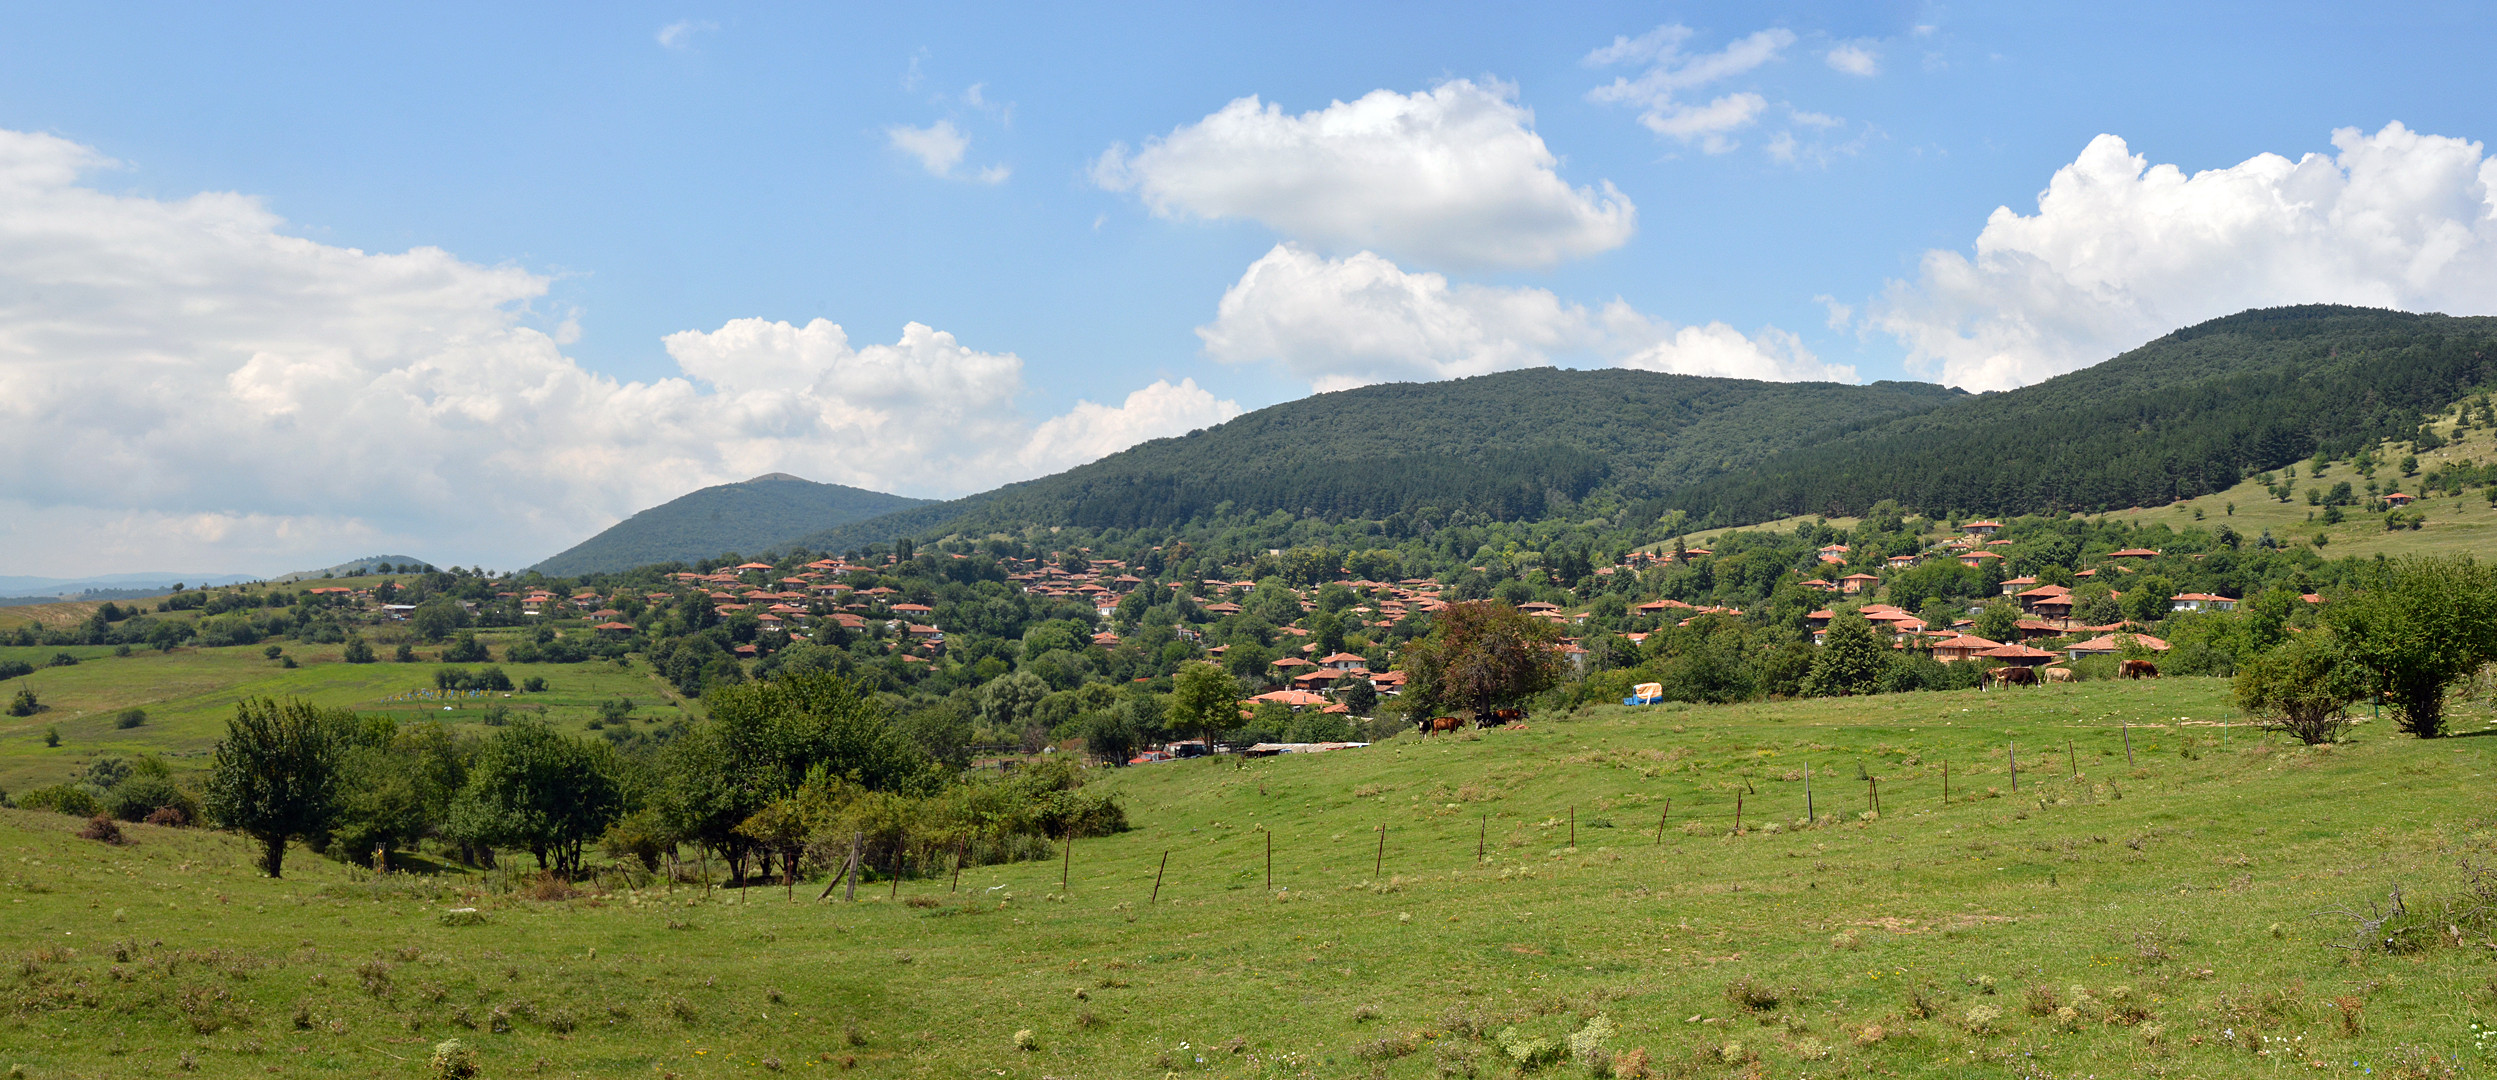 Bulgarienreise XVIII